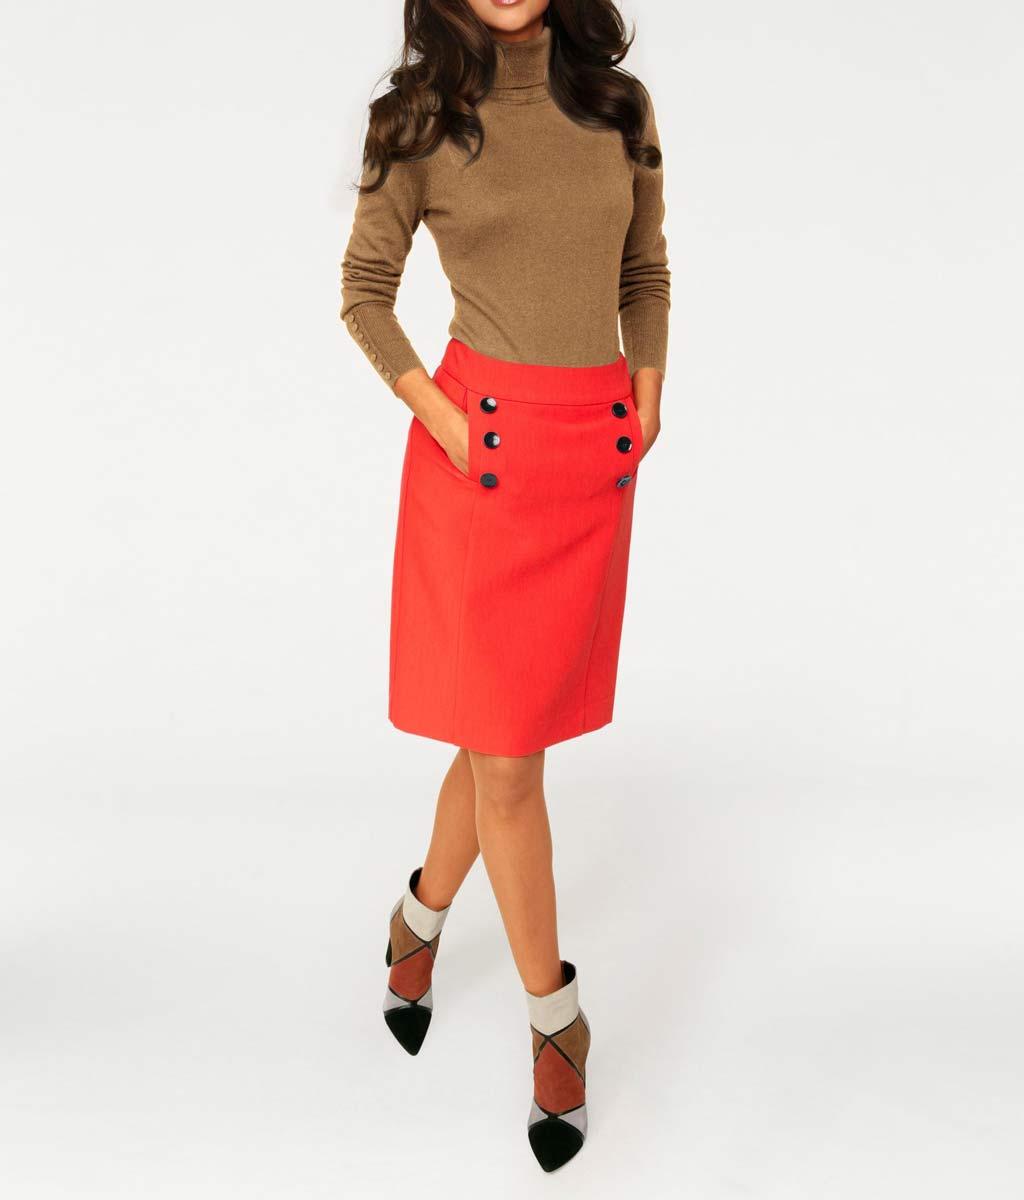 017.589 ASHLEY BROOKE Damen Designer-Rollkragenpullover m. 10% Kaschmir Rolli Camel